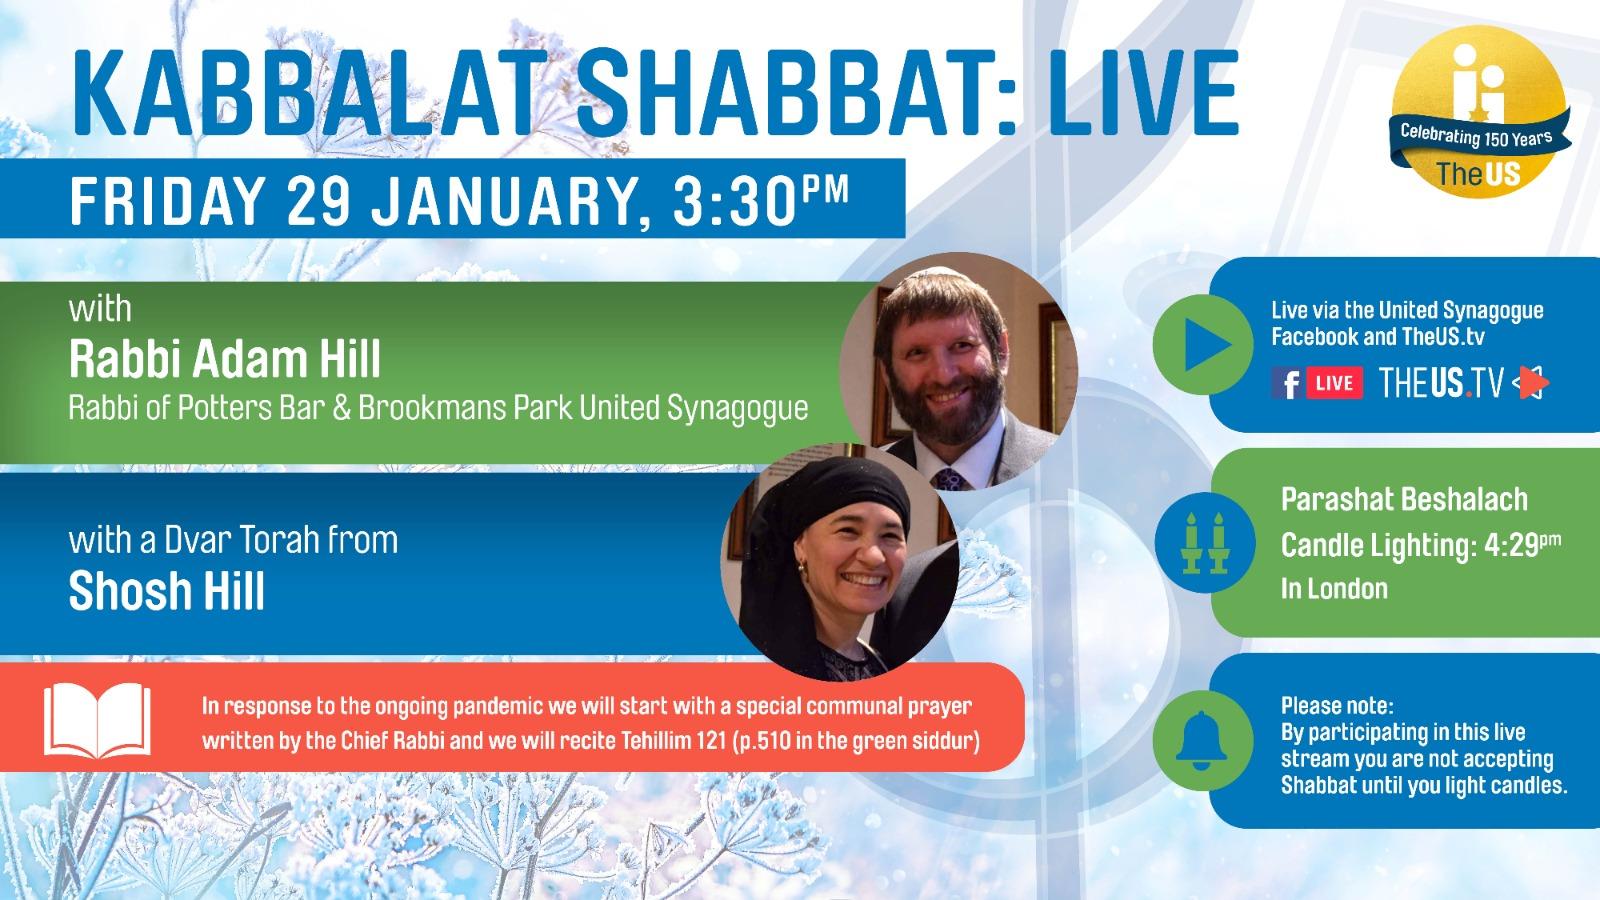 Kabbalat Shabbat: Live at 3:30pm